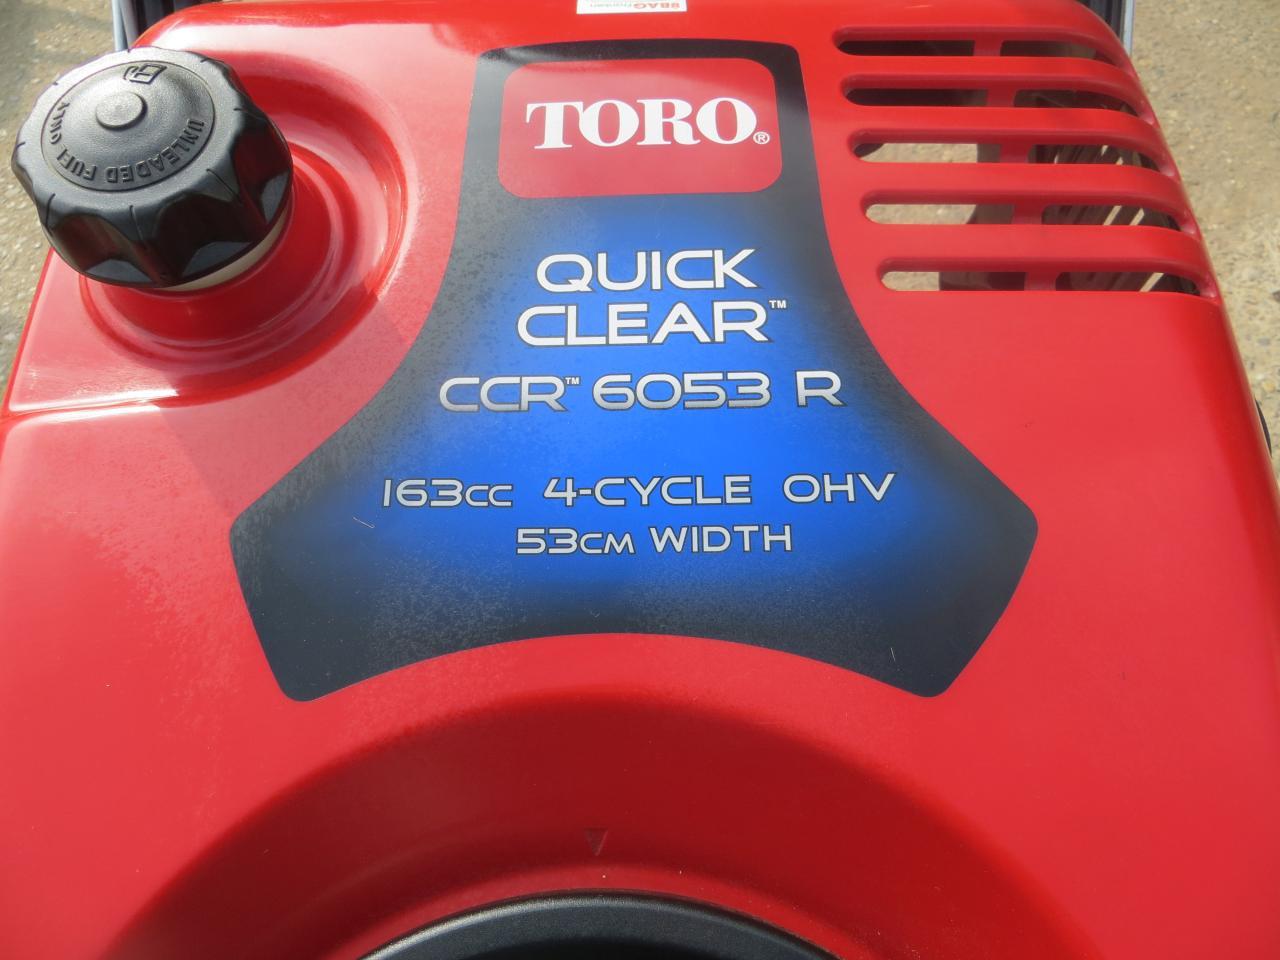 Toro CCR 6053